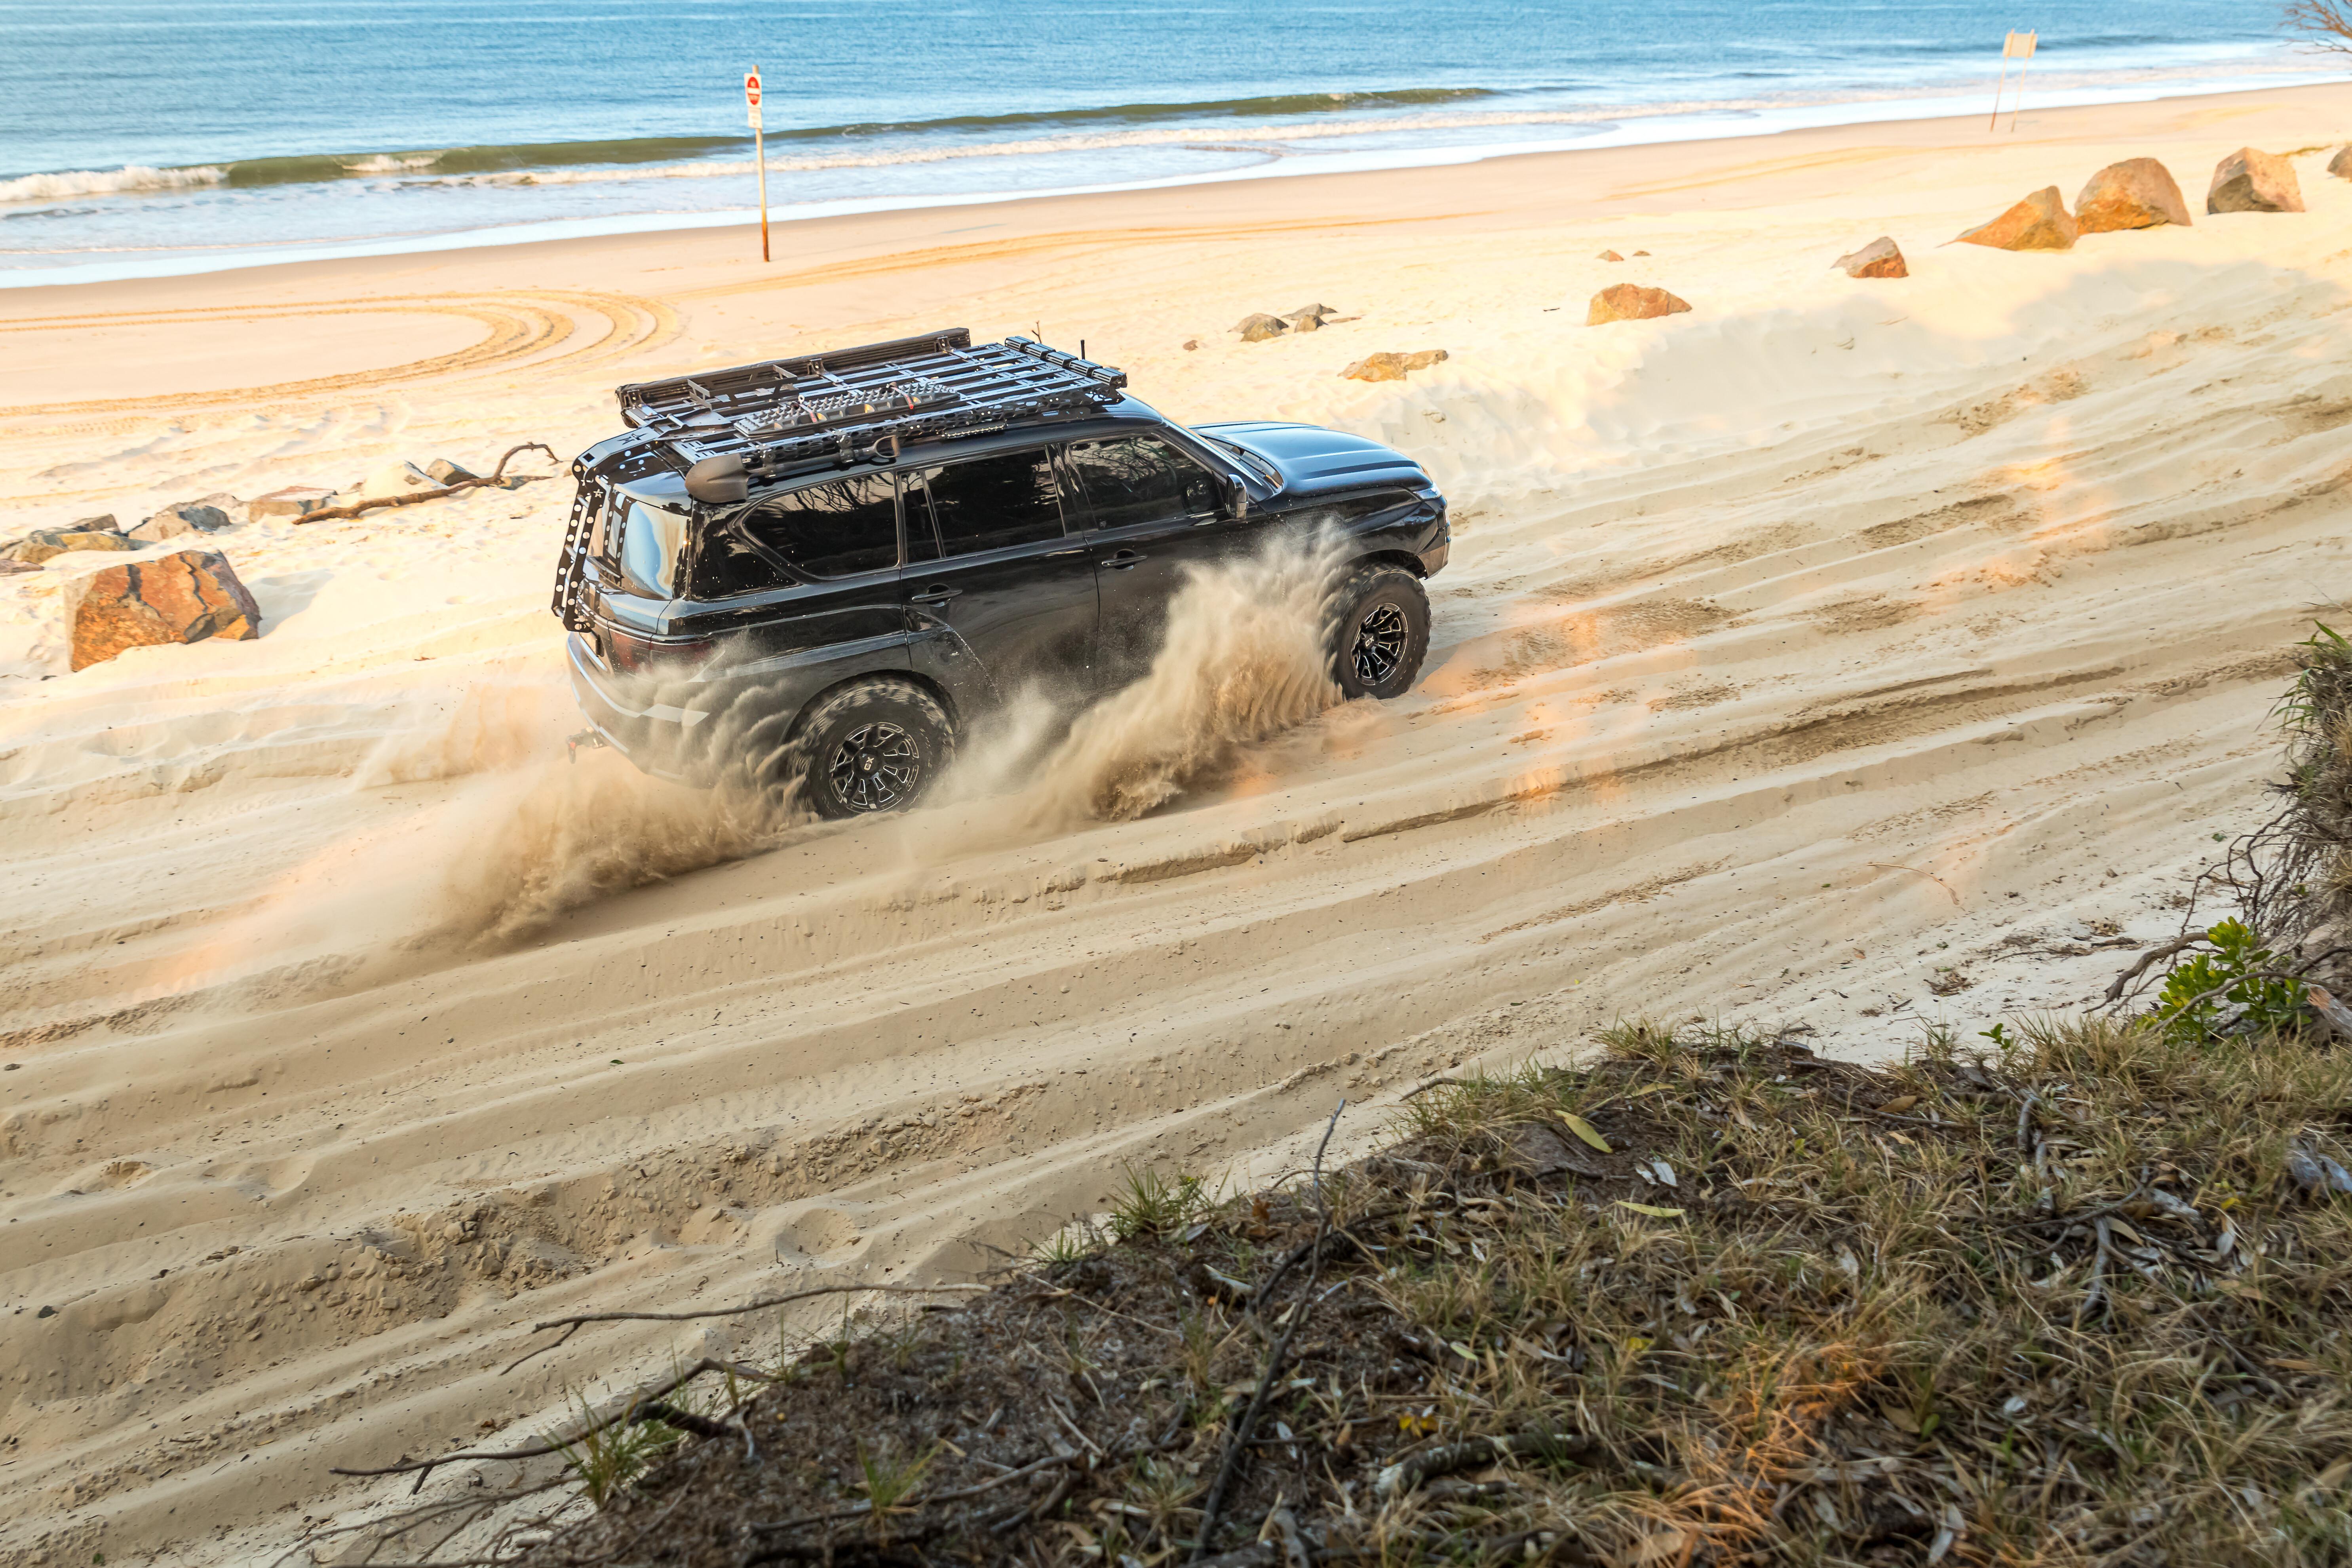 4 X 4 Australia Reviews 2021 September 2021 Custom Nissan Y 62 Patrol Sand 4